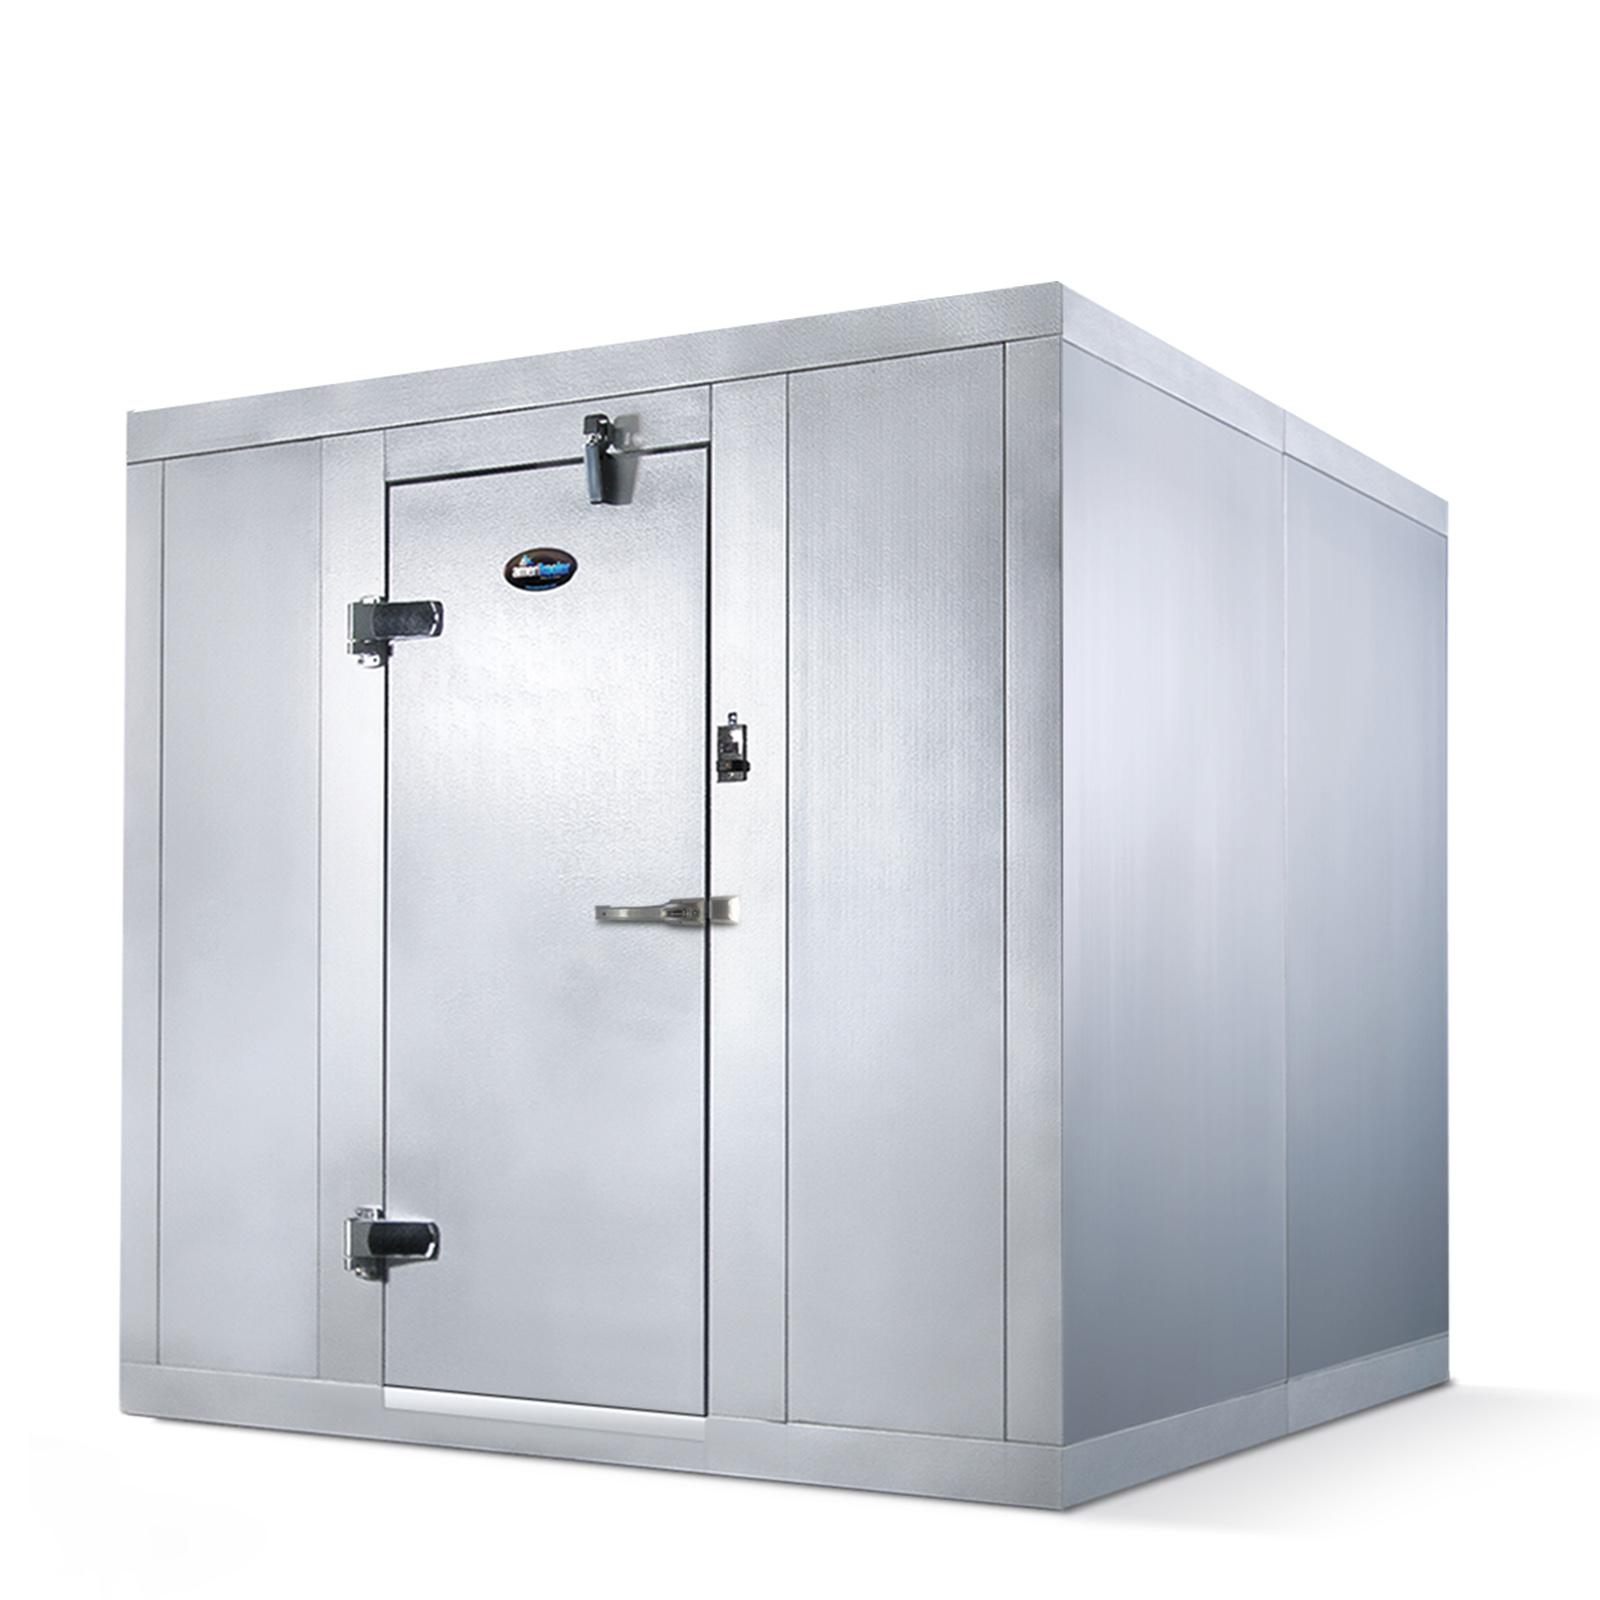 AmeriKooler DC081272**NBRC-O walk in cooler, modular, remote